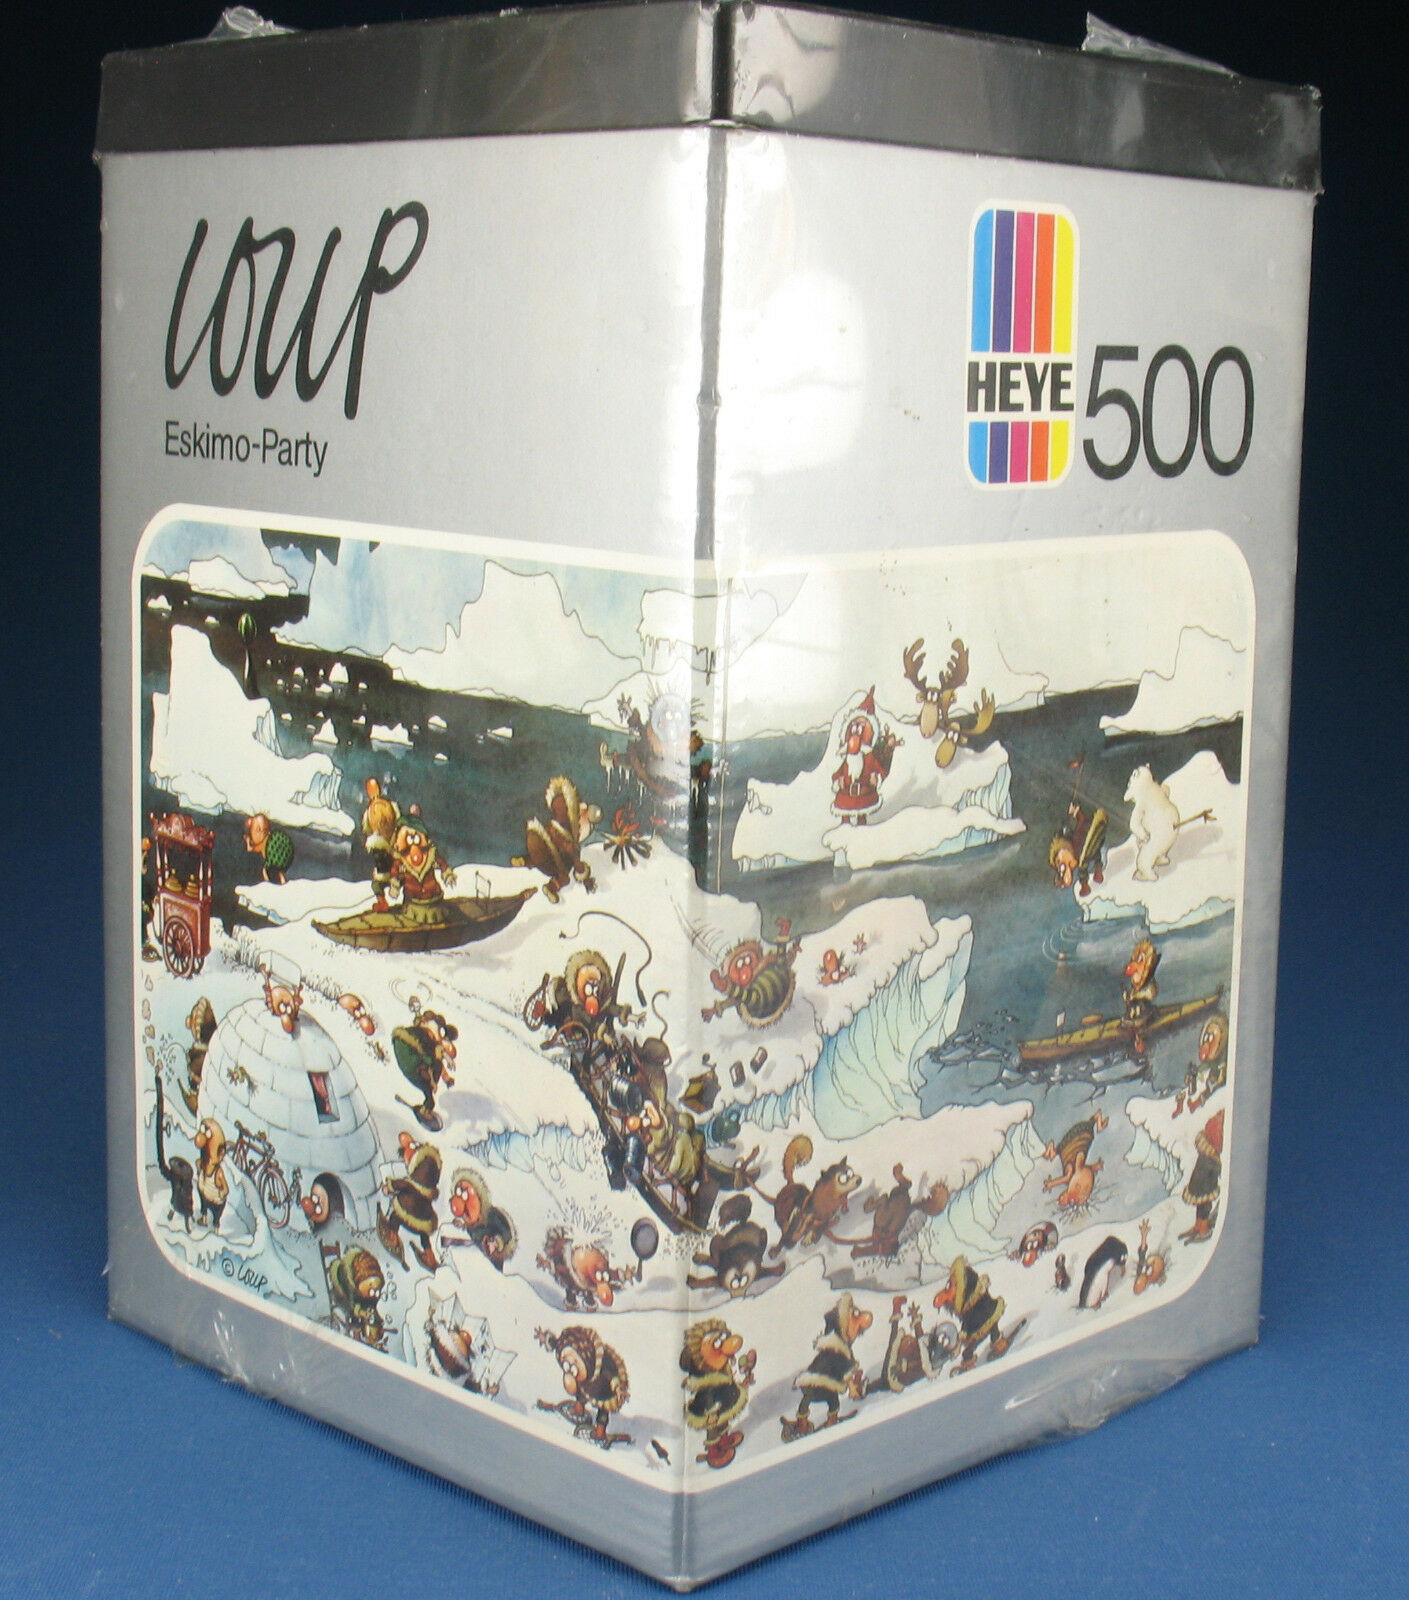 HEYE HEYE HEYE Dreieck PUZZLE 8317 - LOUP - Eskimo Party - 500 Teile - 1974 - NEU - NEW b9ebd9